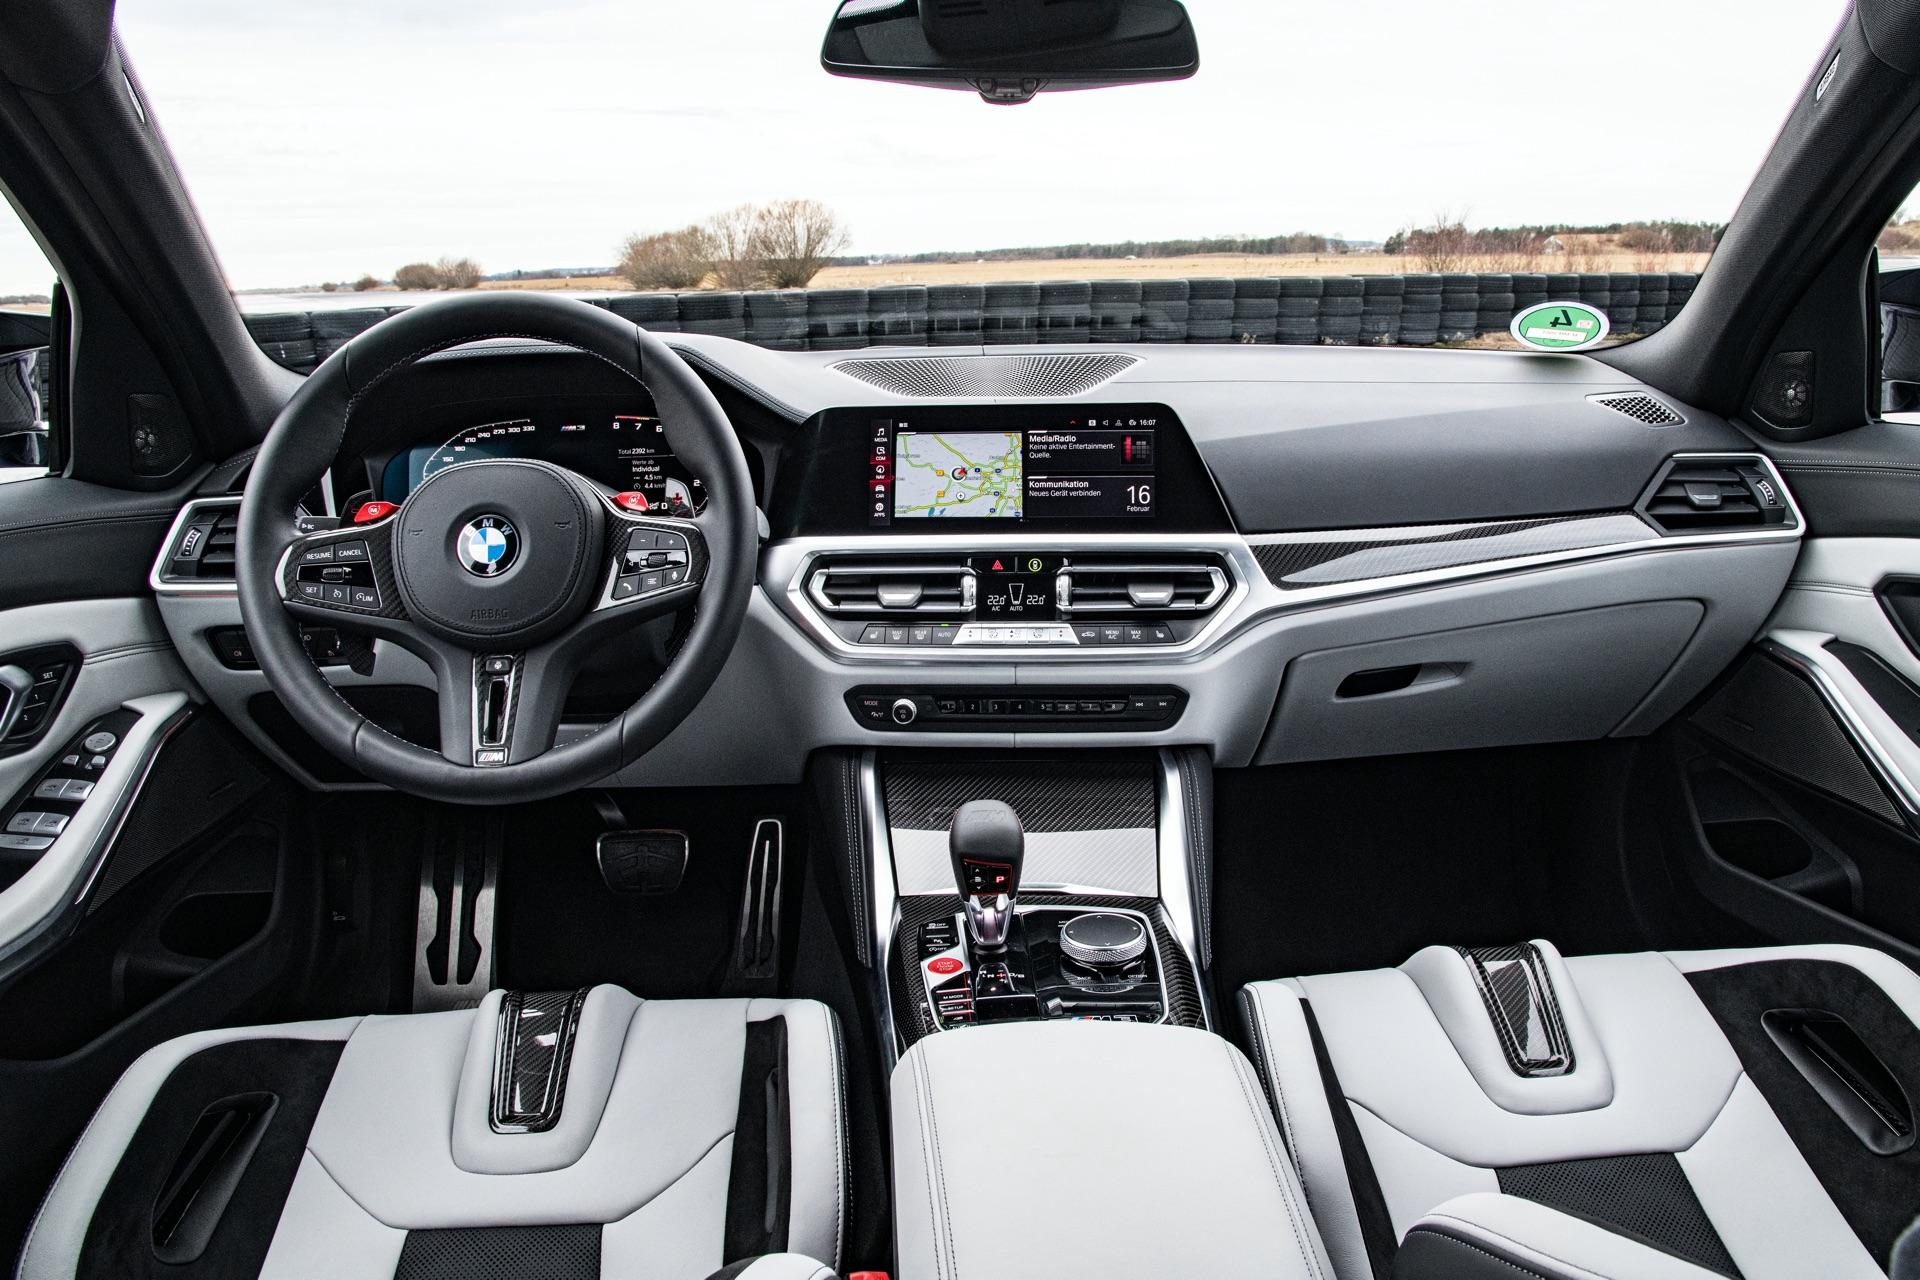 2022 BMW M3 white interior